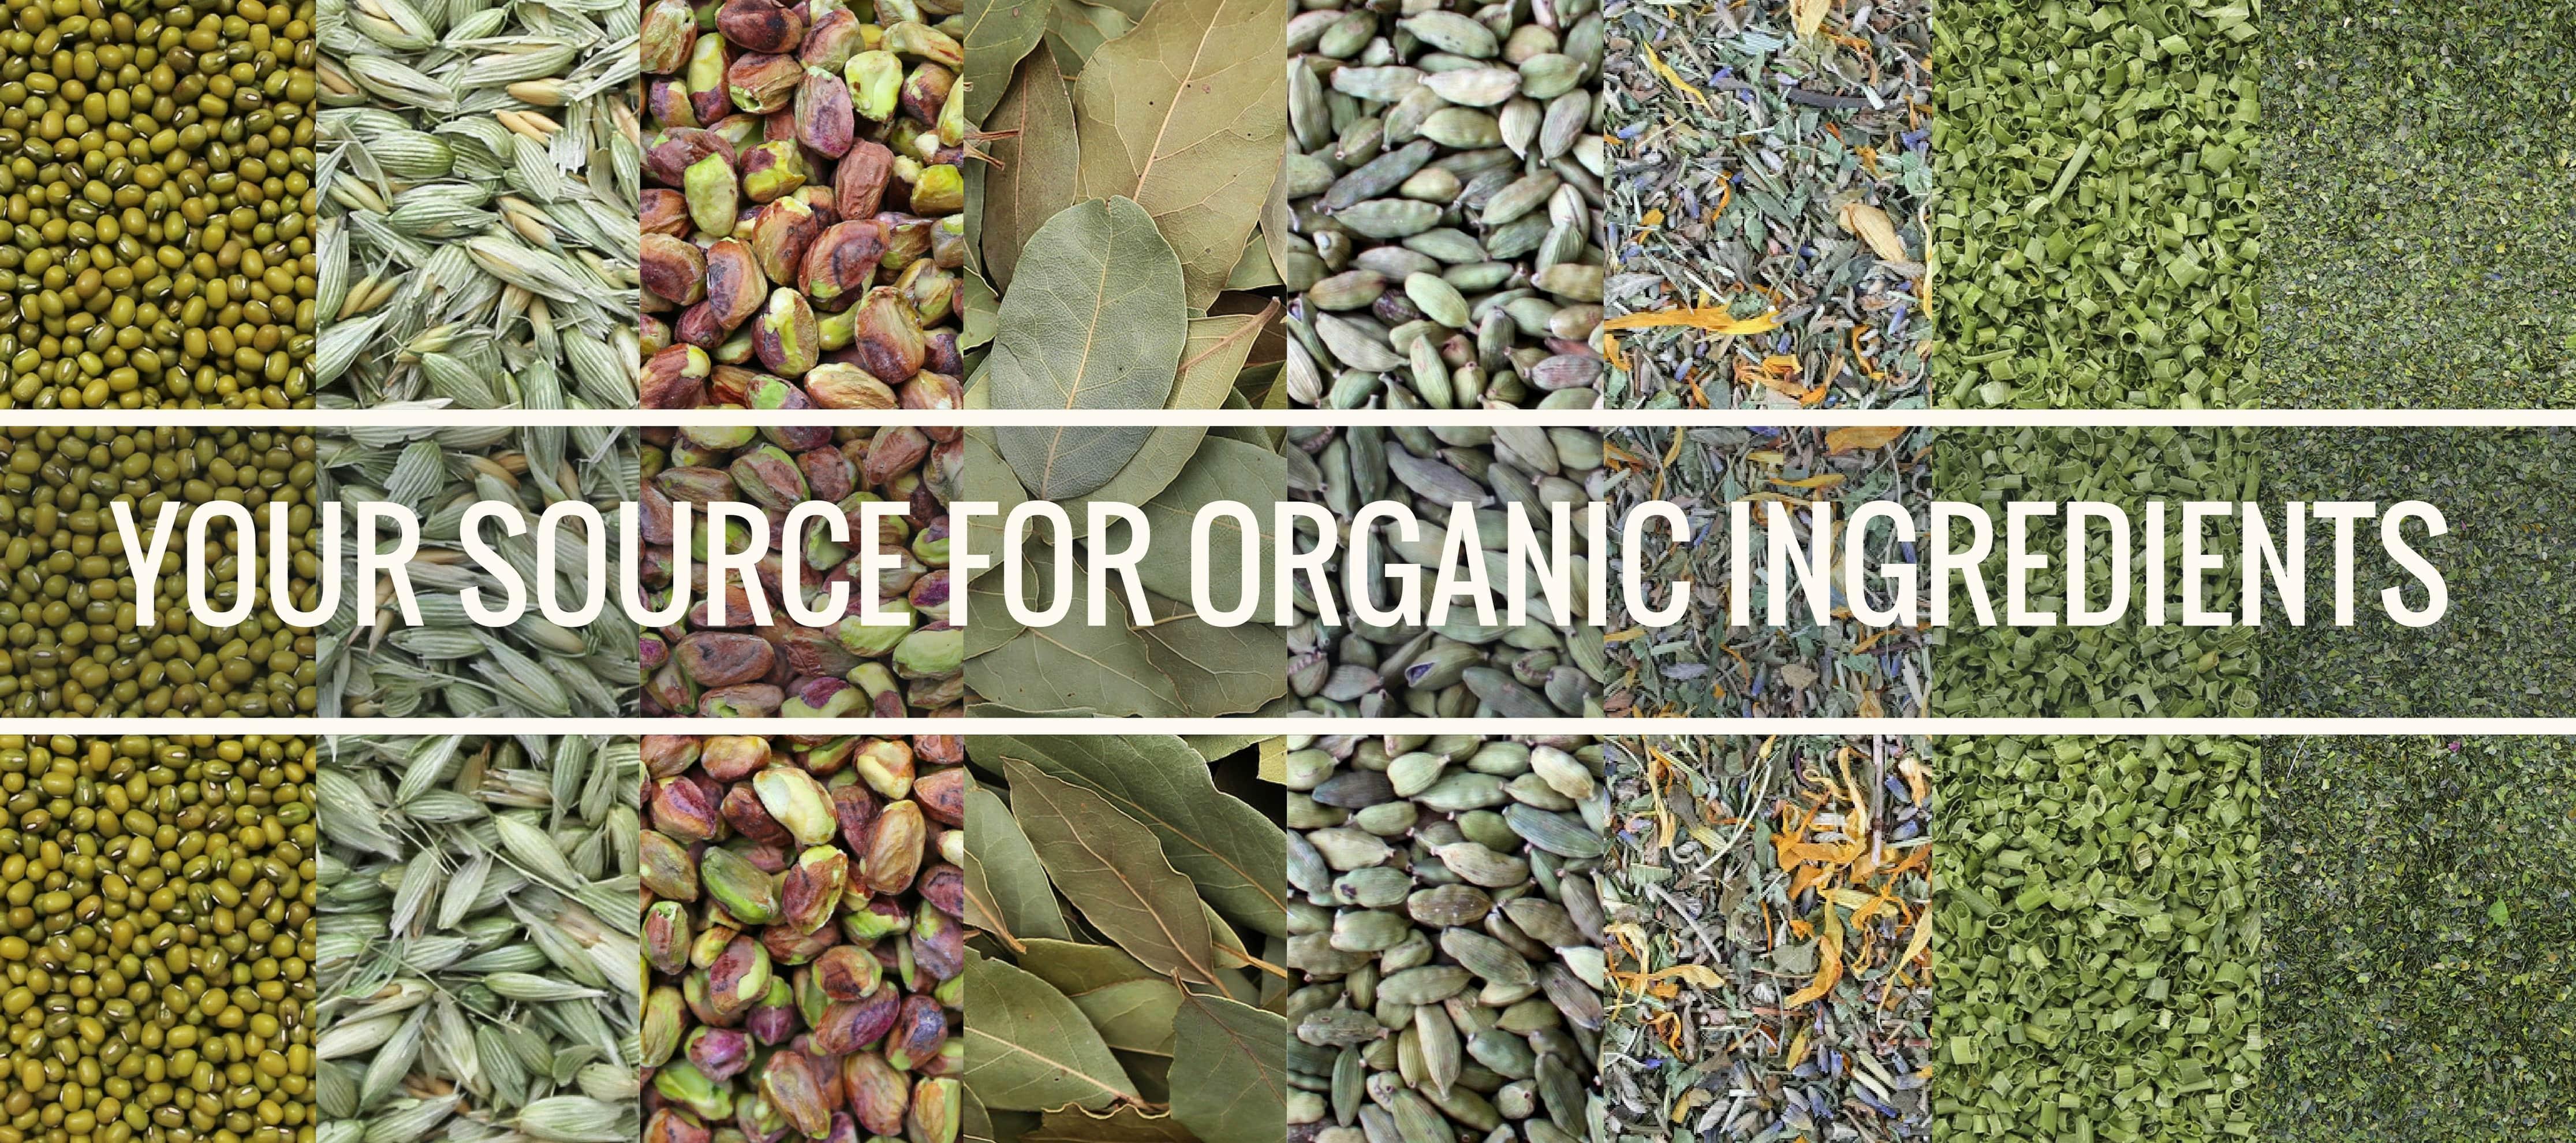 Bulk herbs spices organic organic herbal tea - Organic Matters Wholesale Organic Bulk Foods Herbs Spices Superfoods And Teas